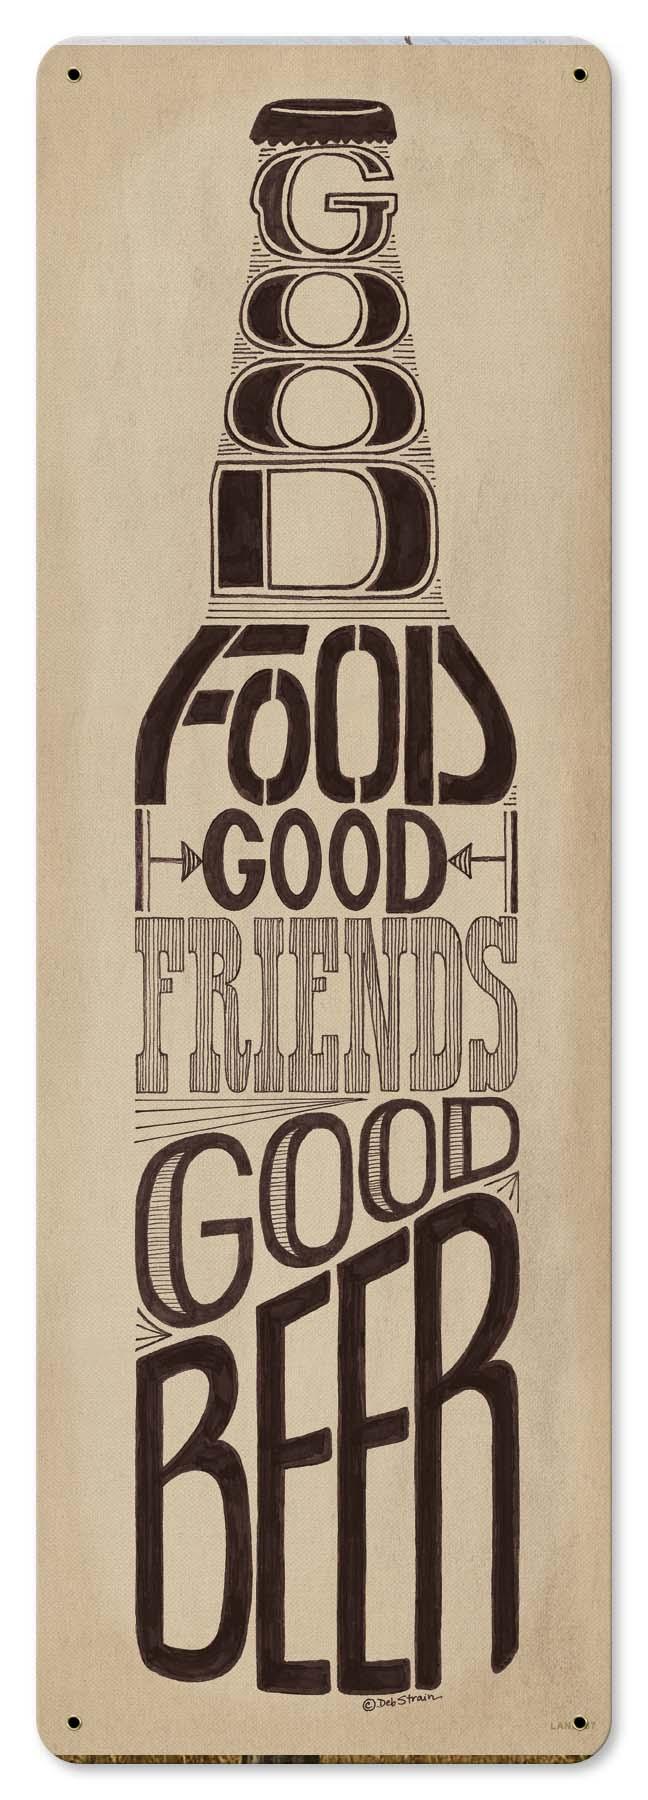 Good Food Friends Beer Vintage Sign